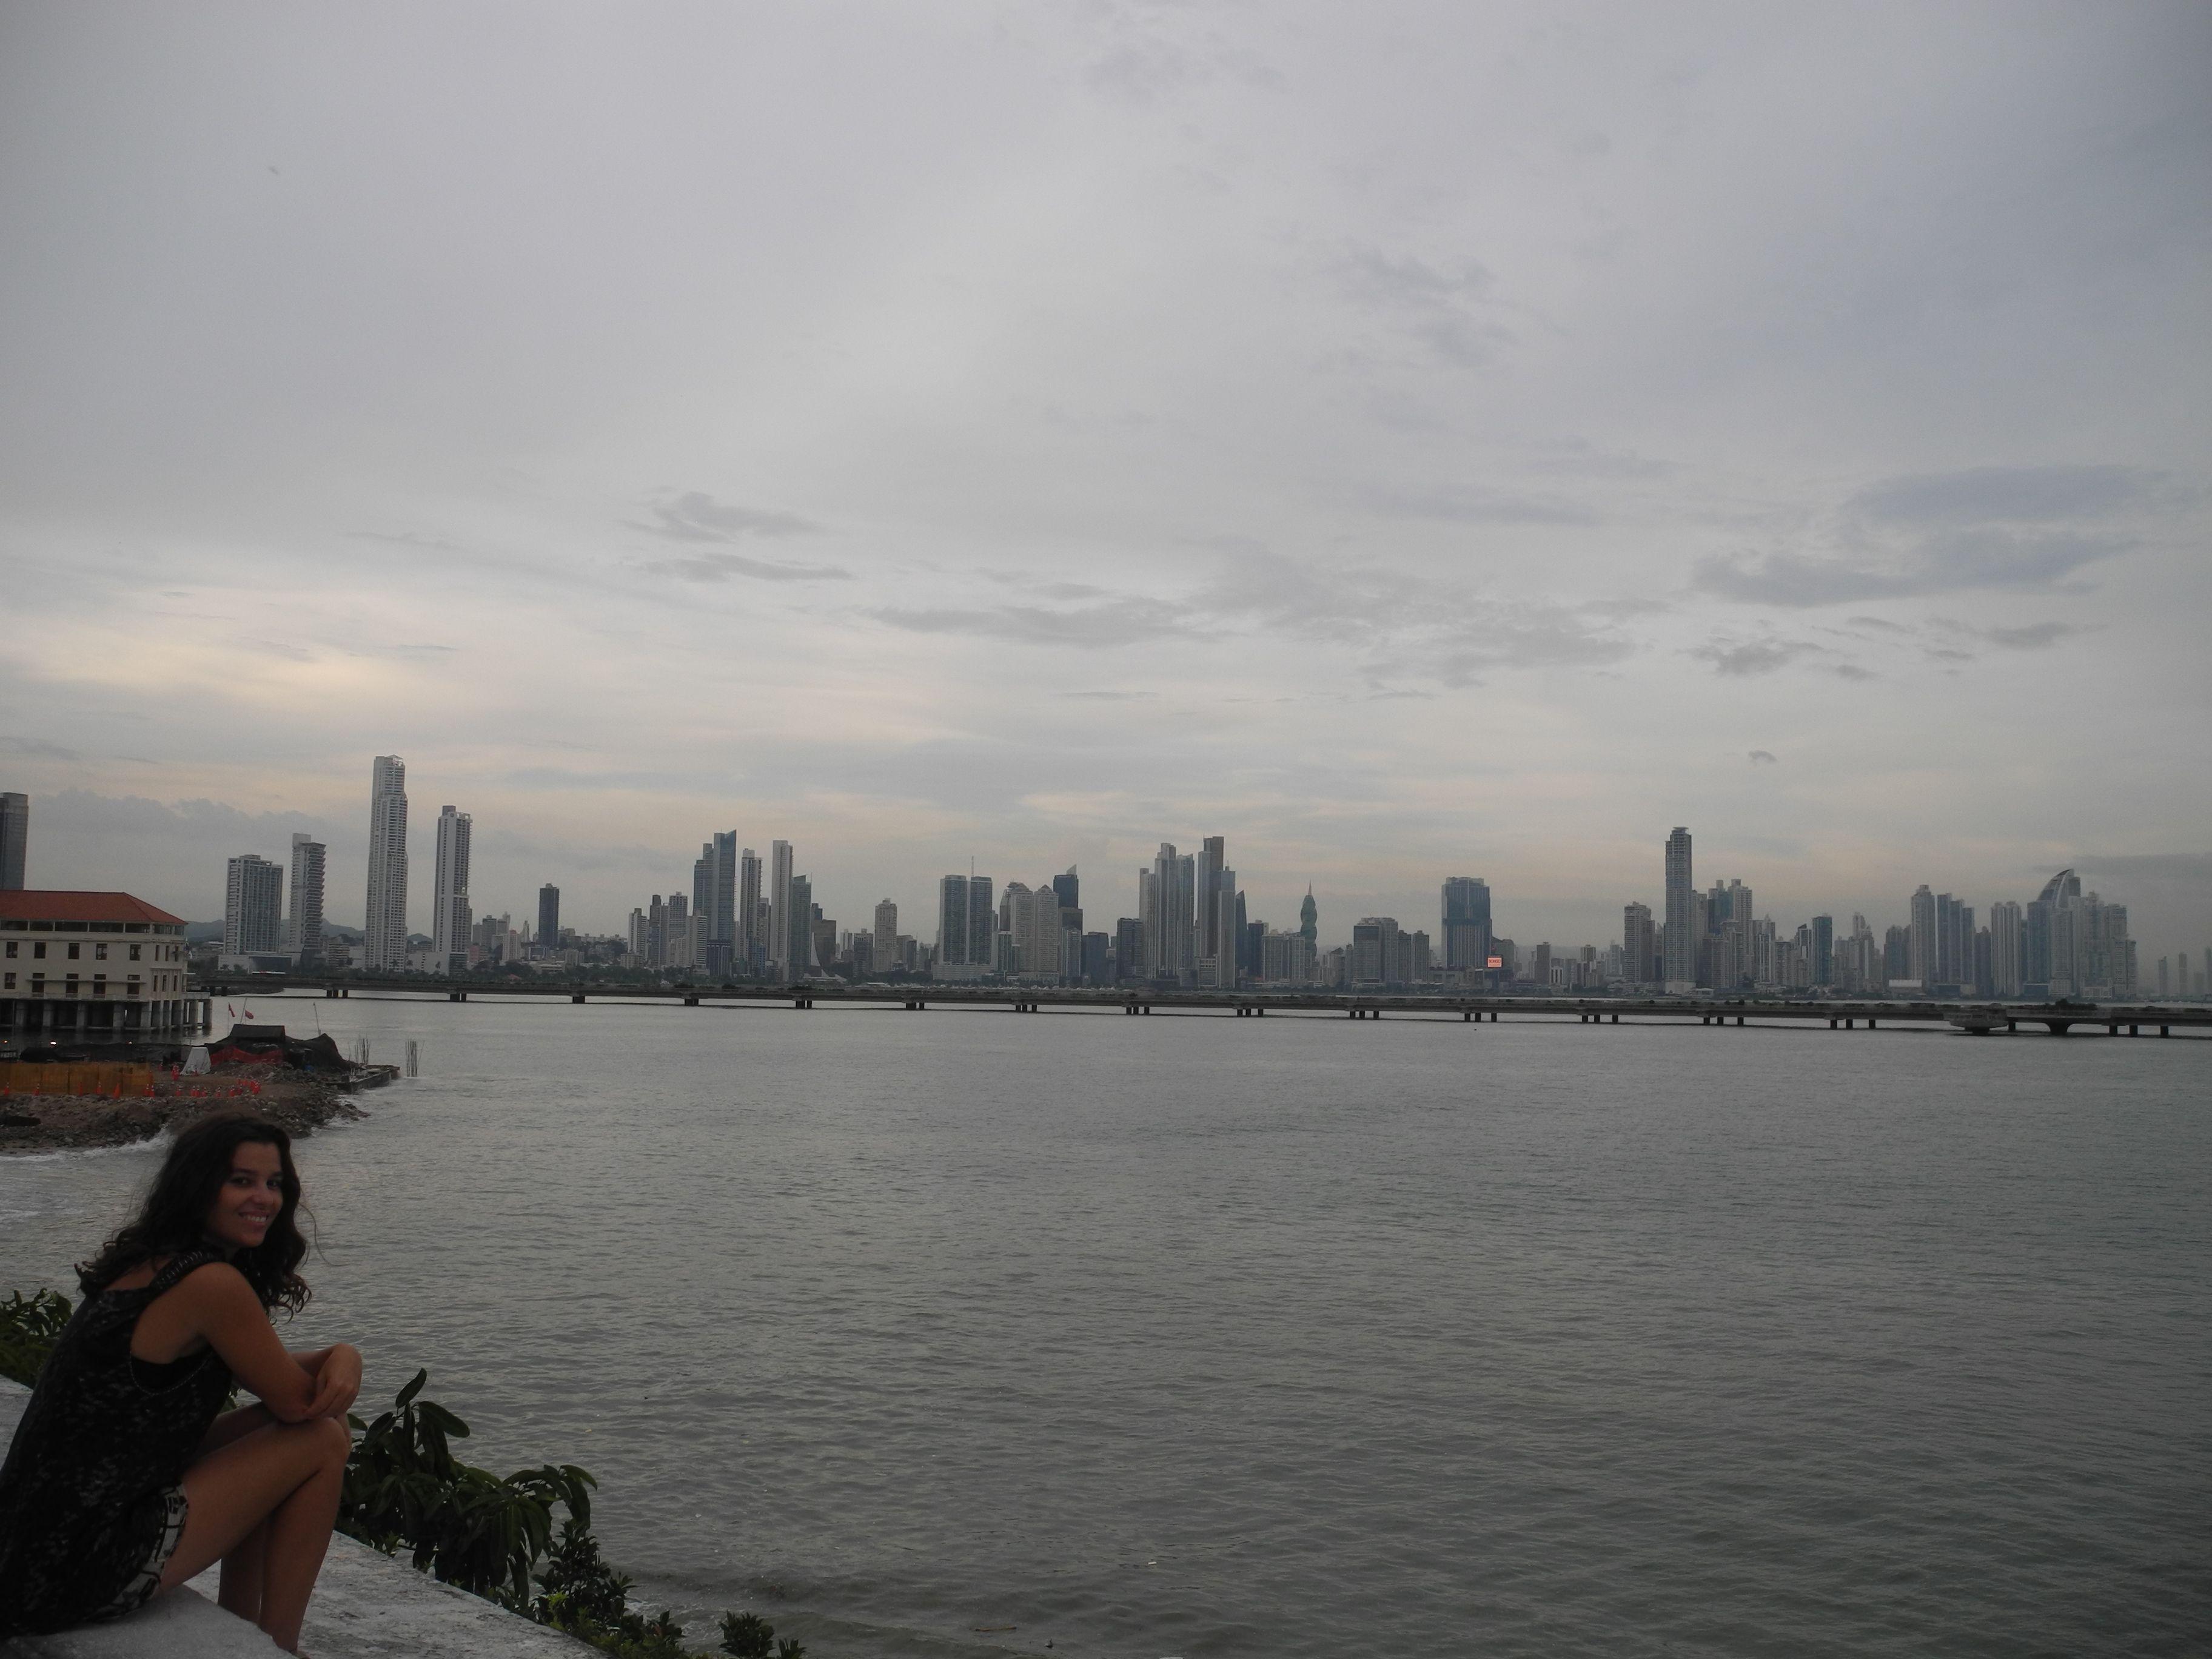 Semaine de grisaille au Panama